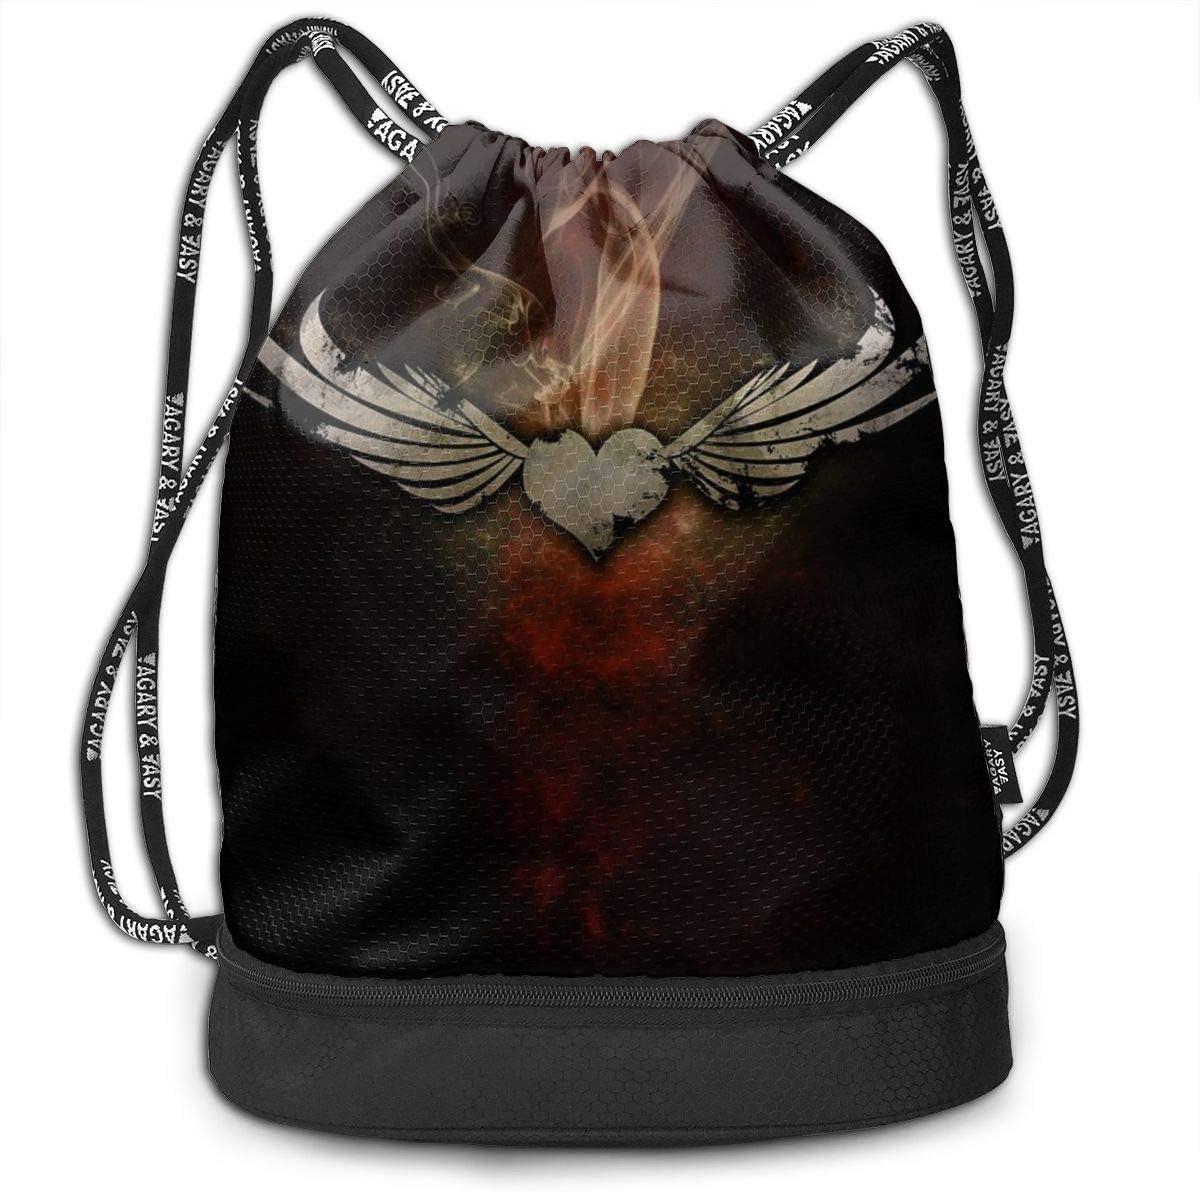 GymSack Drawstring Bag Sackpack Cross Sport Cinch Pack Simple Bundle Pocke Backpack For Men Women